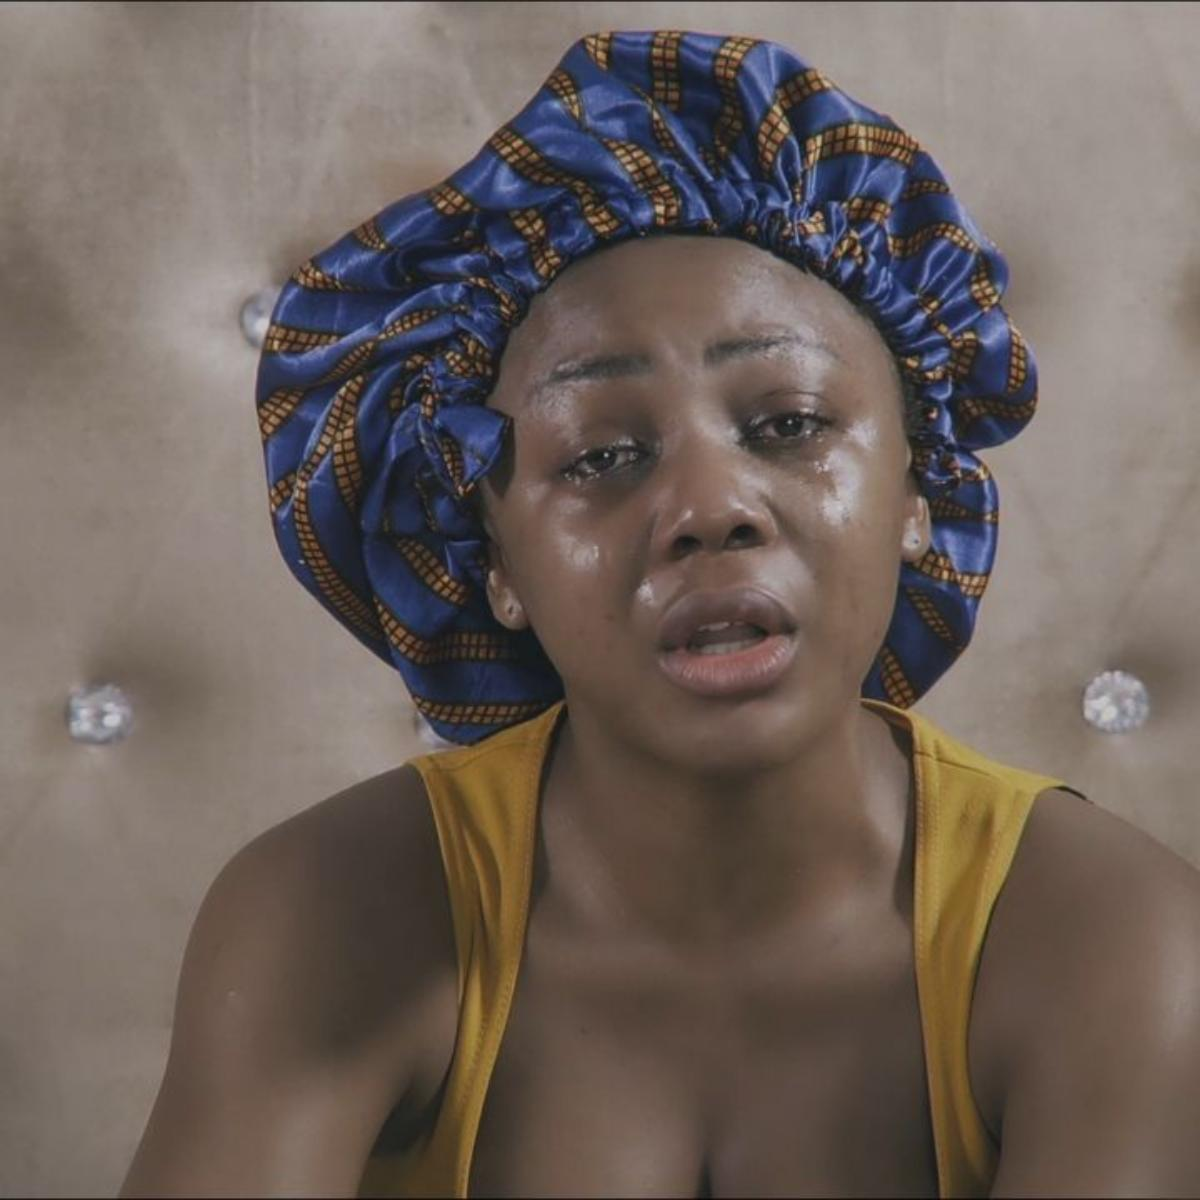 Ifu Ennada Shed Tears Over Multi-Million Hair Business Shutdown